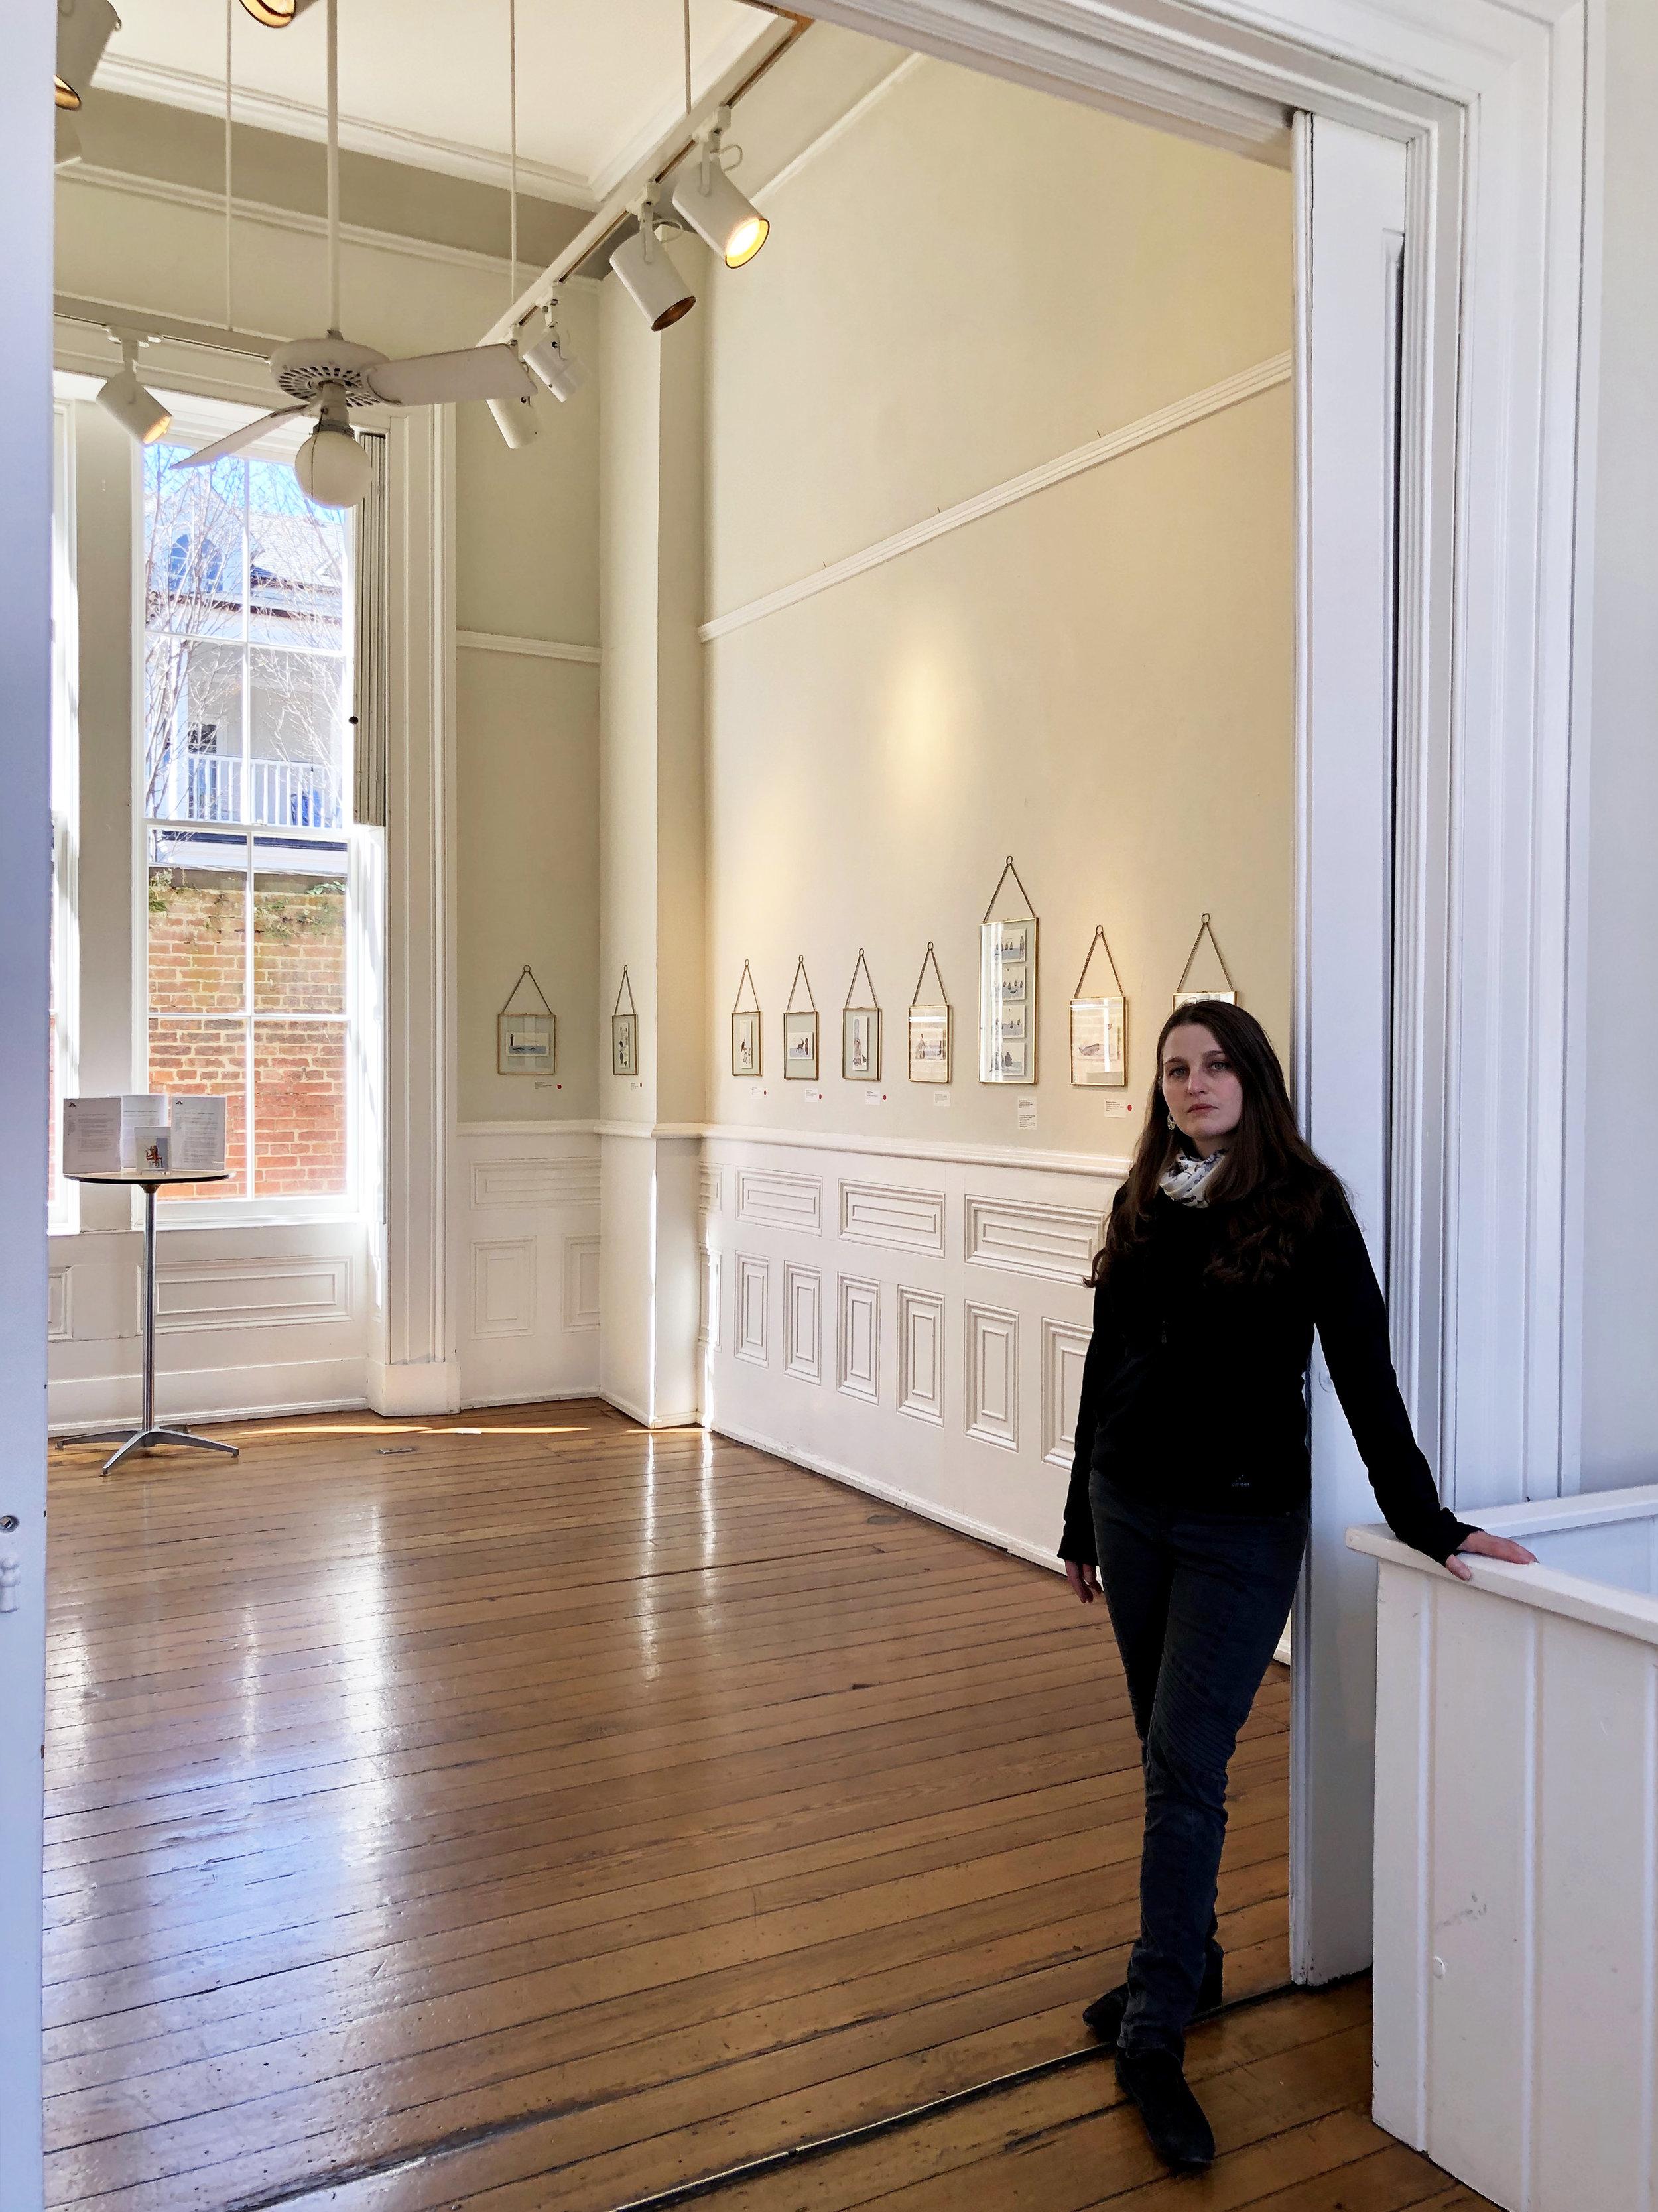 The Artist with Checks & Balances at The Athenaeum Gallery, Alexandria VA. 2019